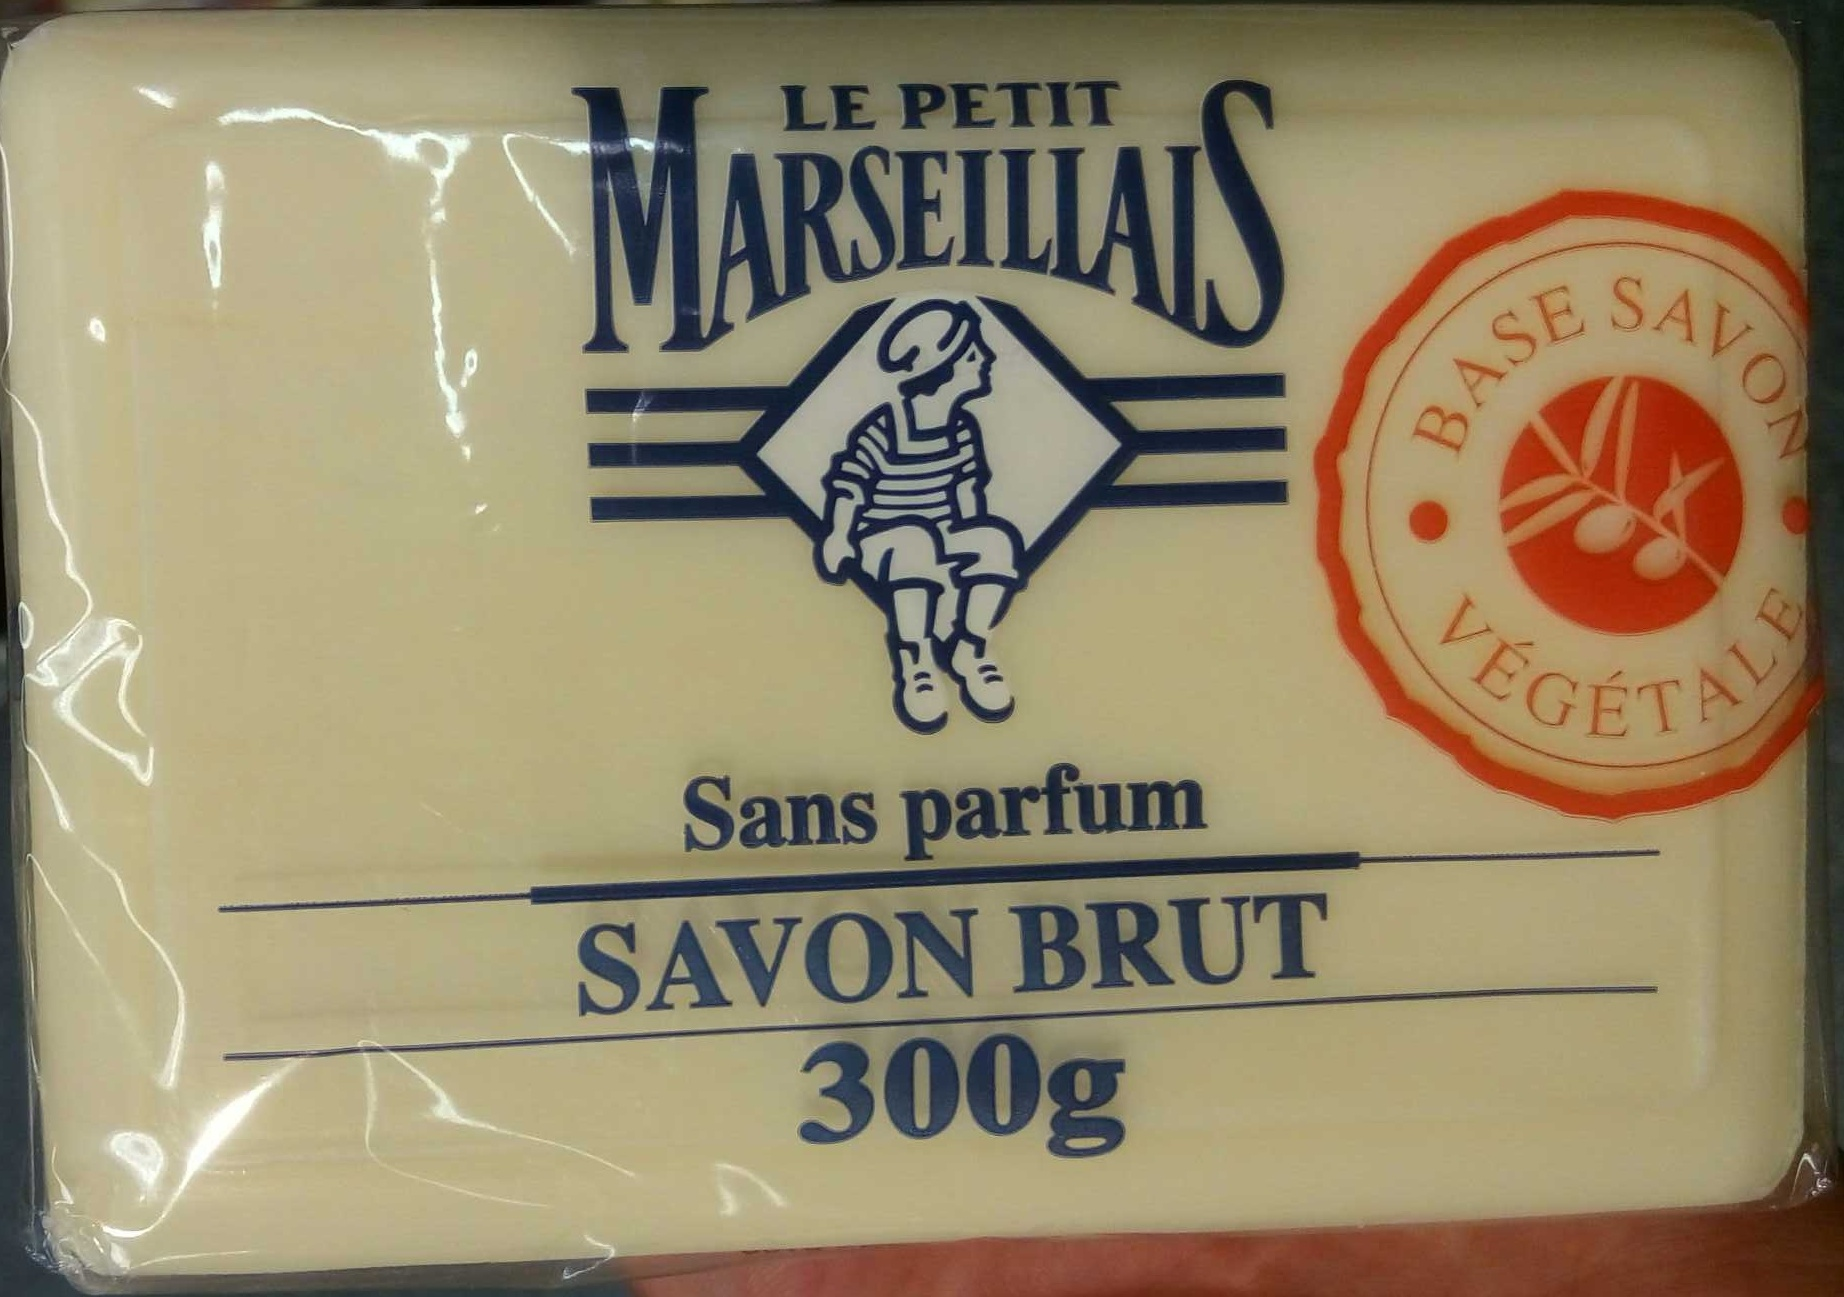 Savon brut - Product